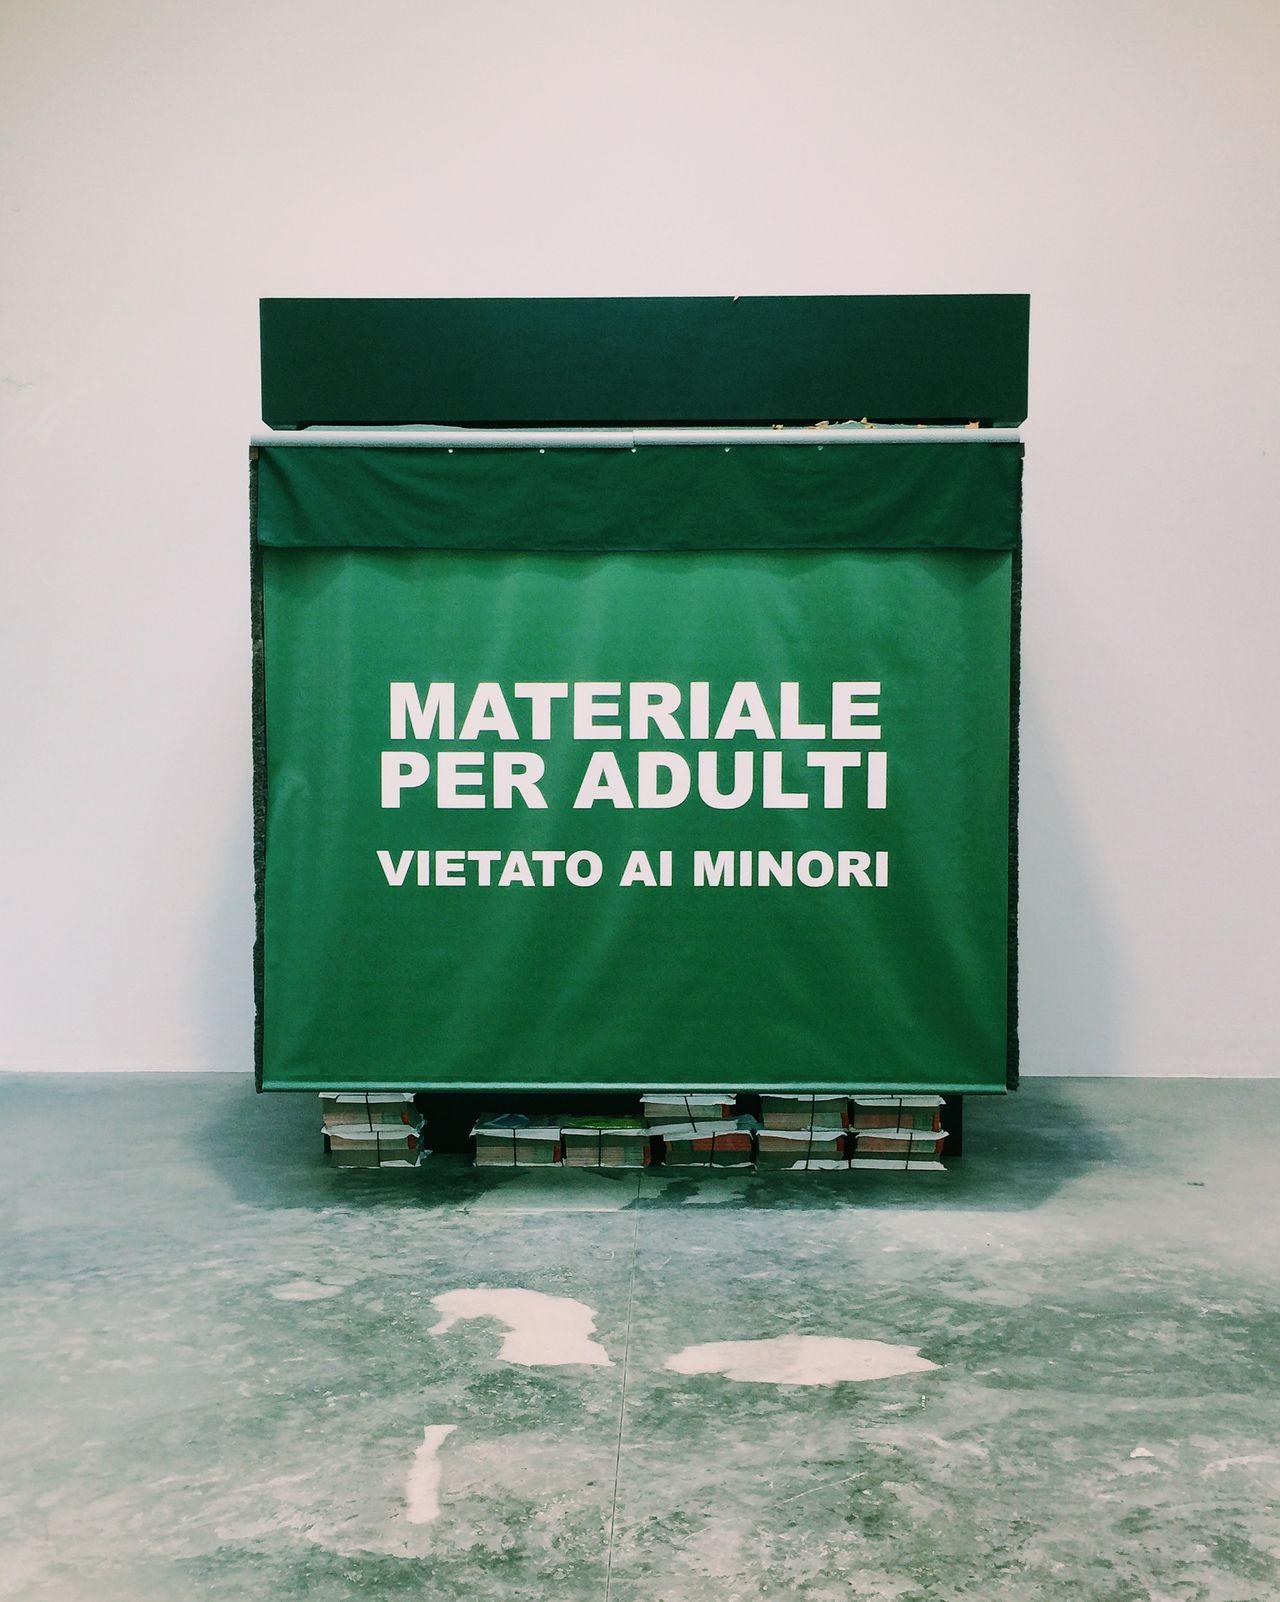 Exibition Minimalism Art La Biennale Di Venezia Venicebiennale2015 Adult Sensitive From Vienna To Milan